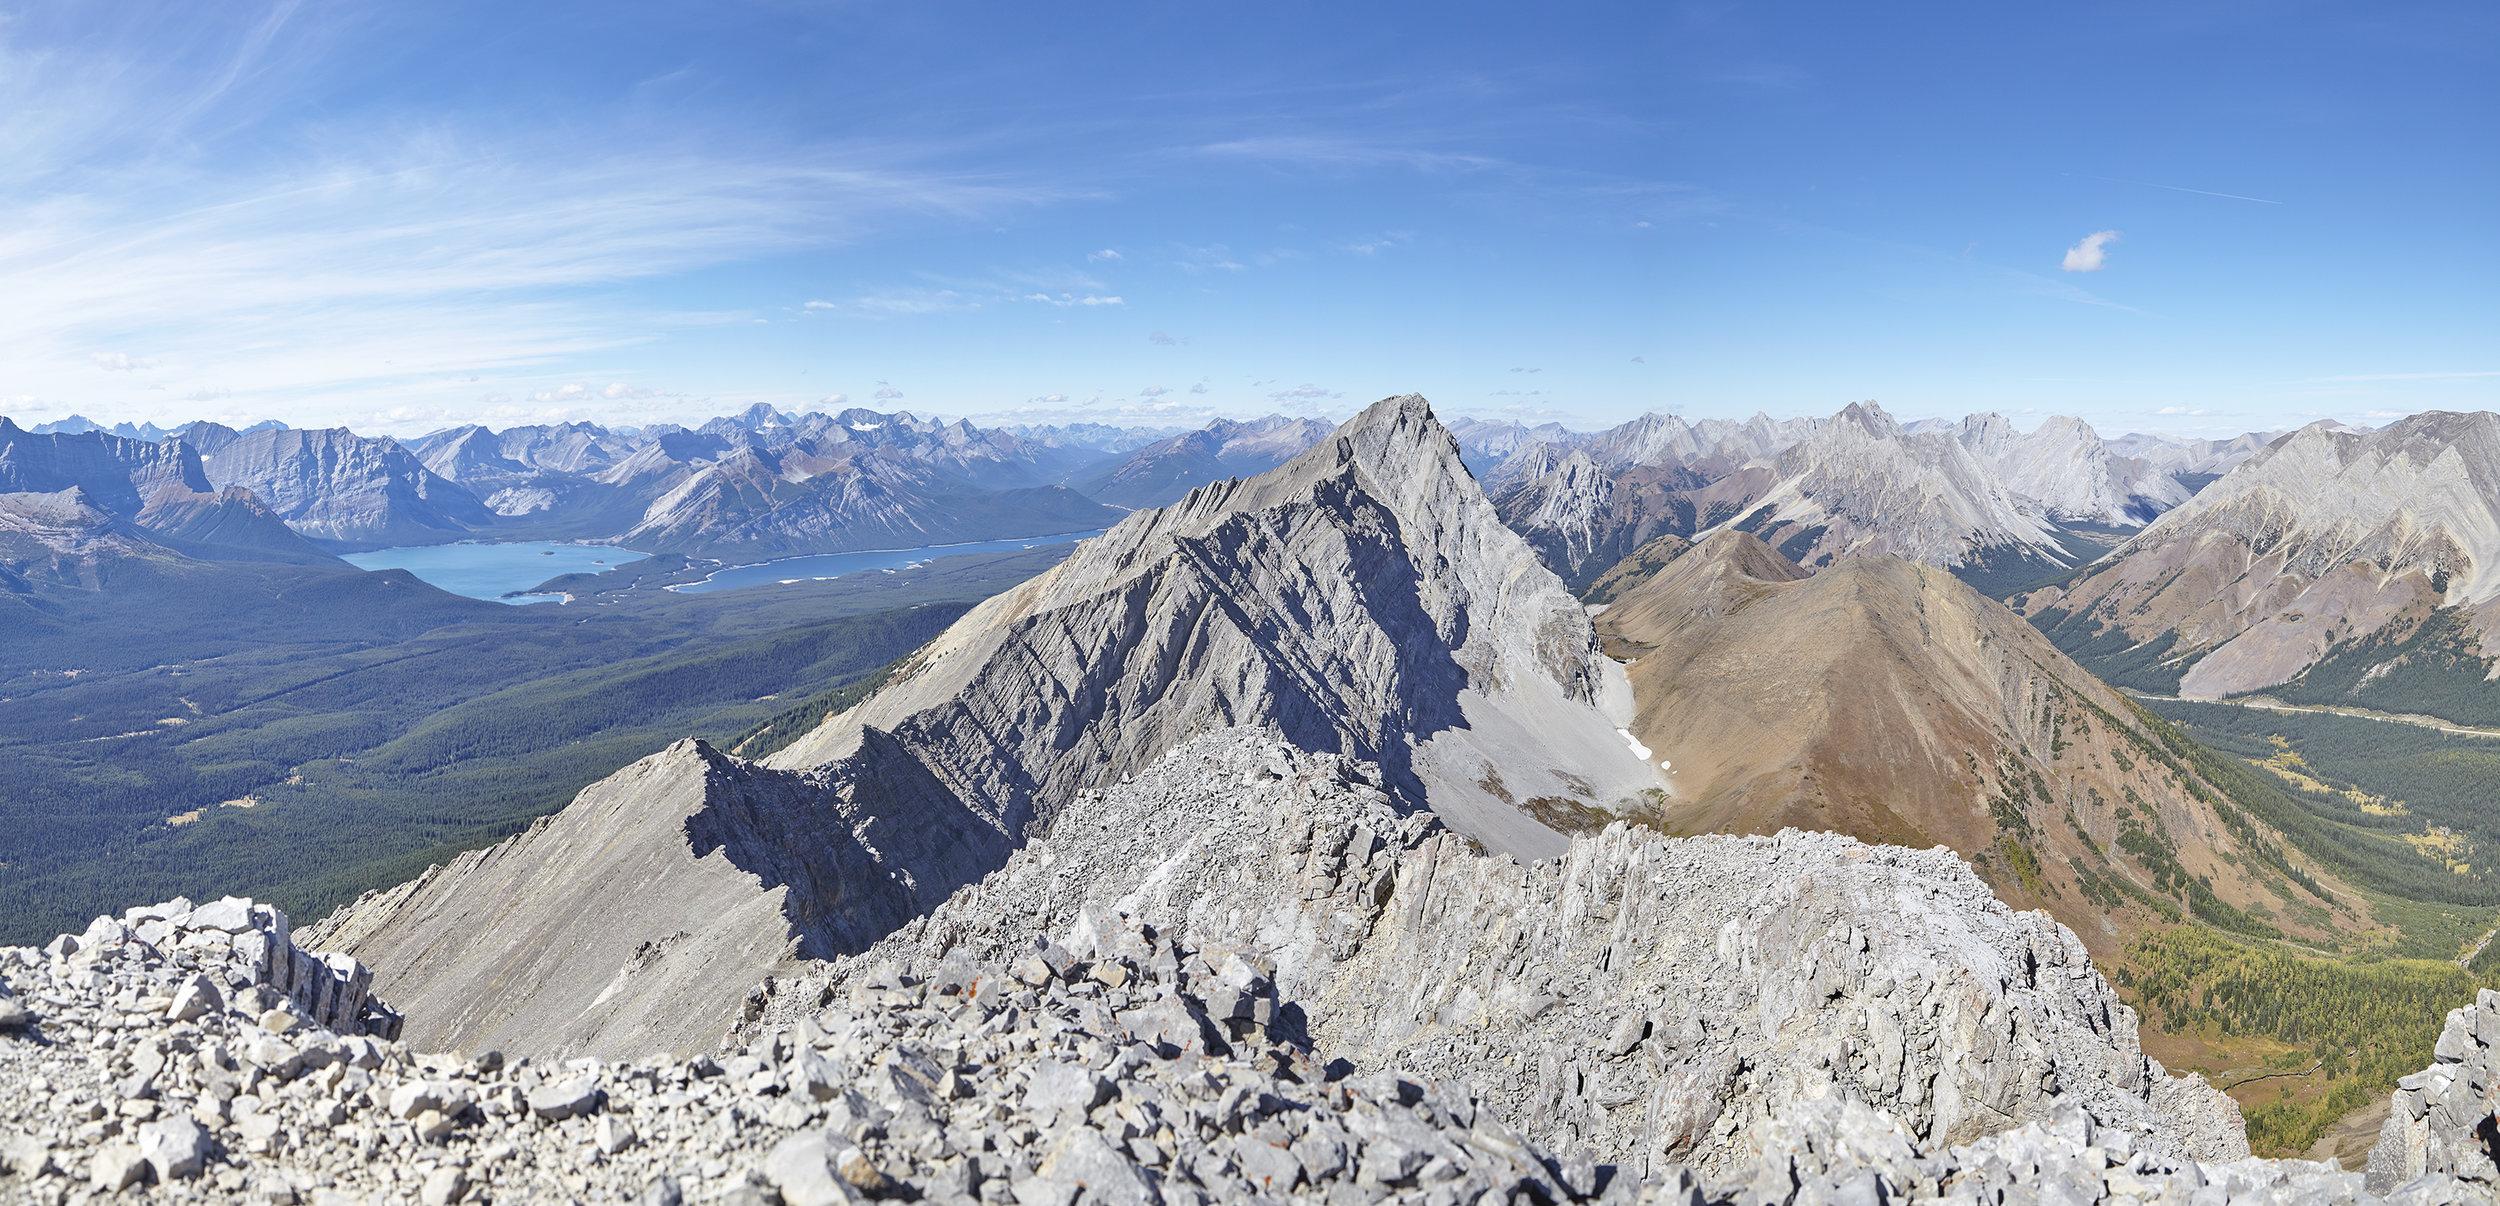 A summit panorama looking north towards Mount Pocaterra and the Kananaskis Lakes.